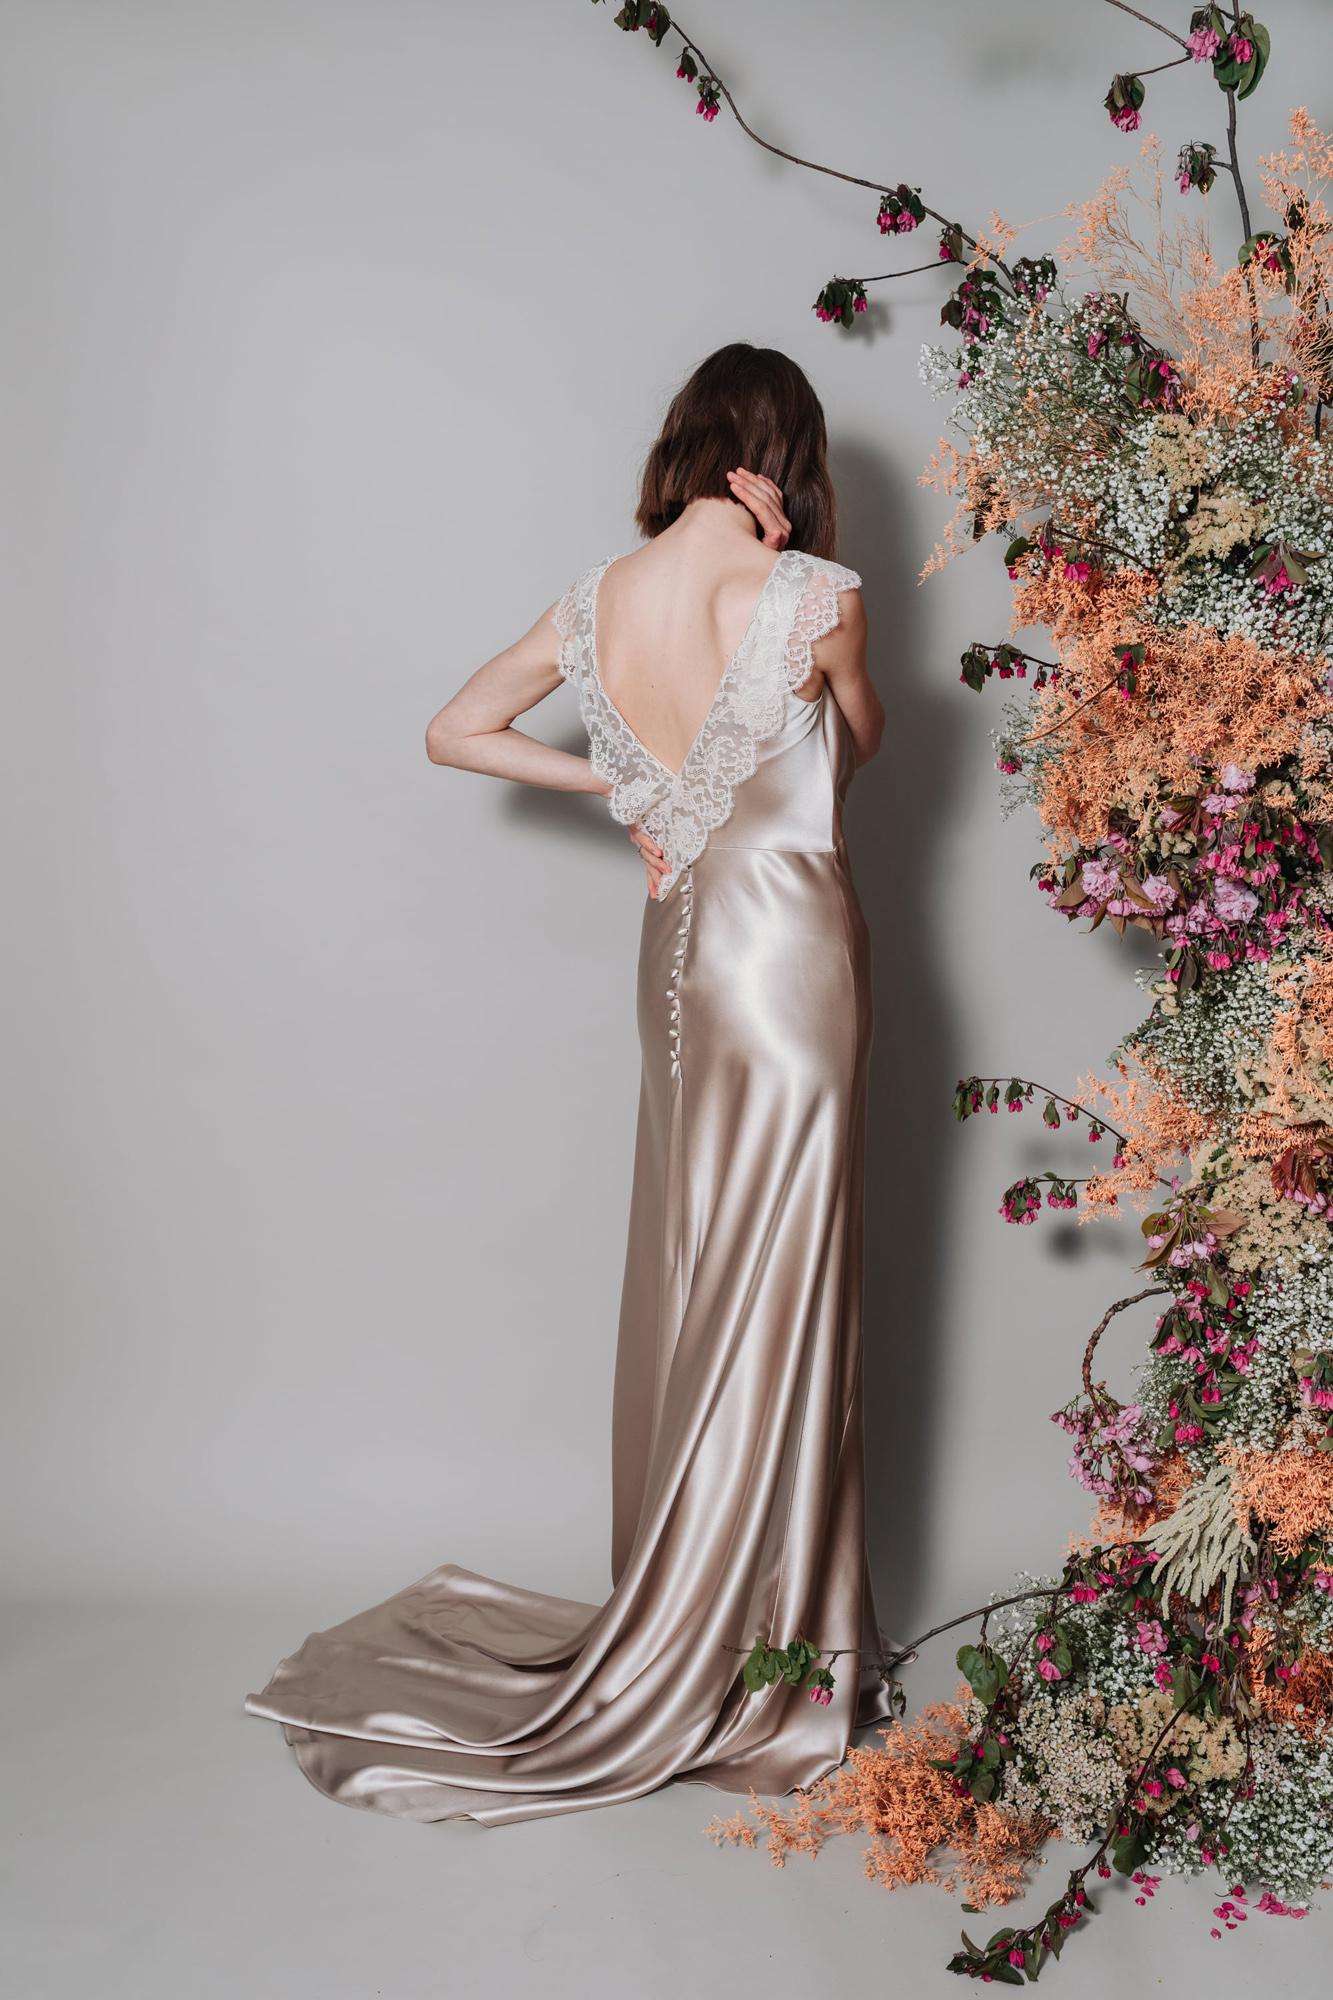 Kate-Beaumont-Sheffield-Honeysuckle-Bias-Cut-Silk-Panelled-Wedding-Gown-12.jpg